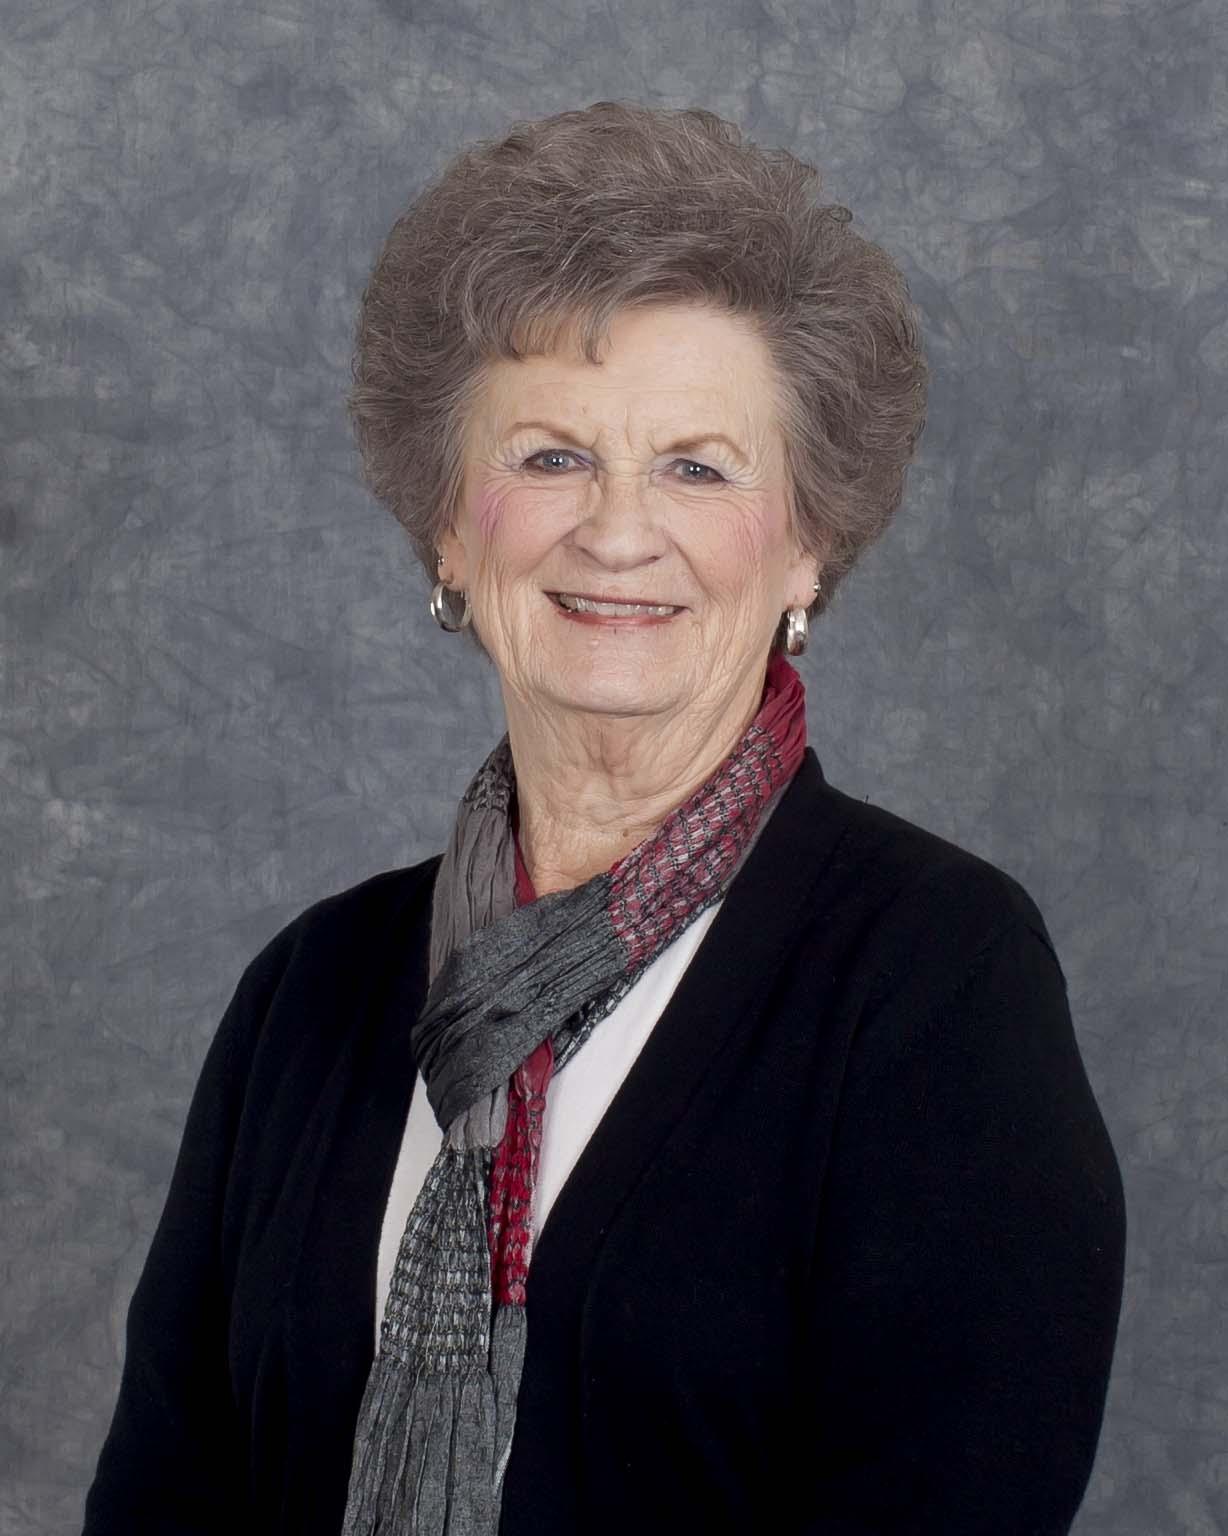 Norma Wohltman